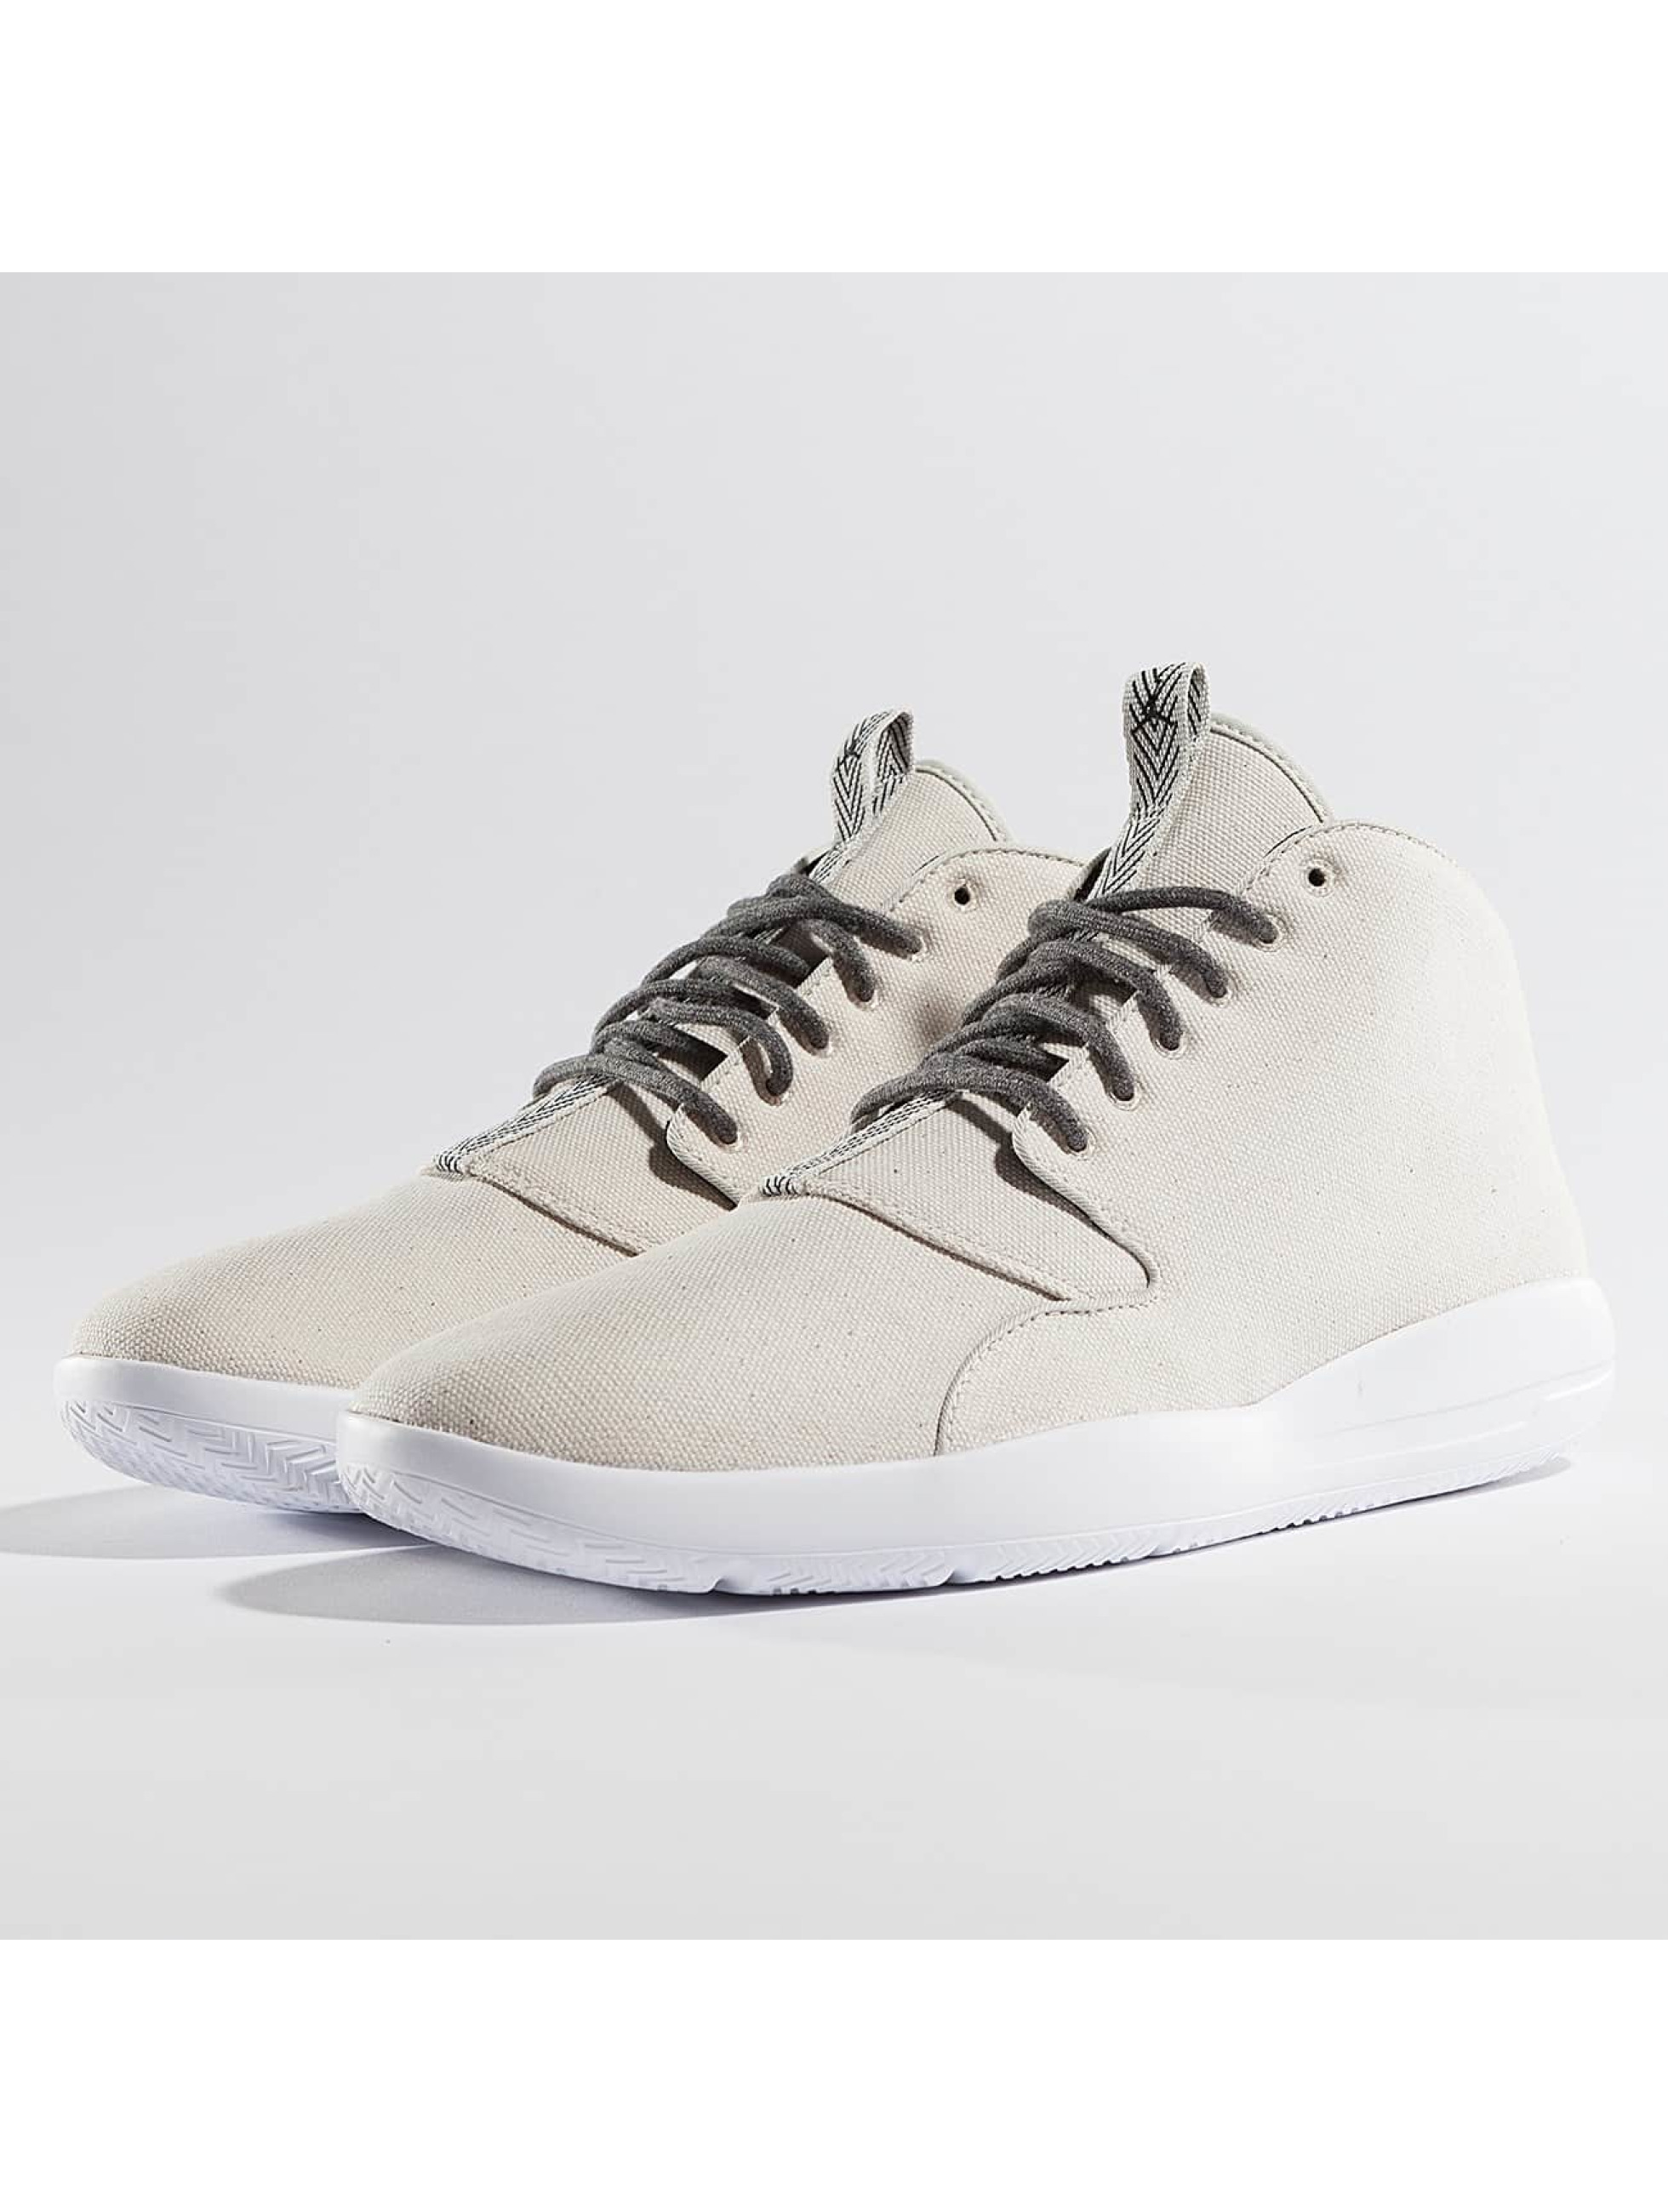 Jordan Männer Sneaker Eclipse Chukka Sneakers in khaki